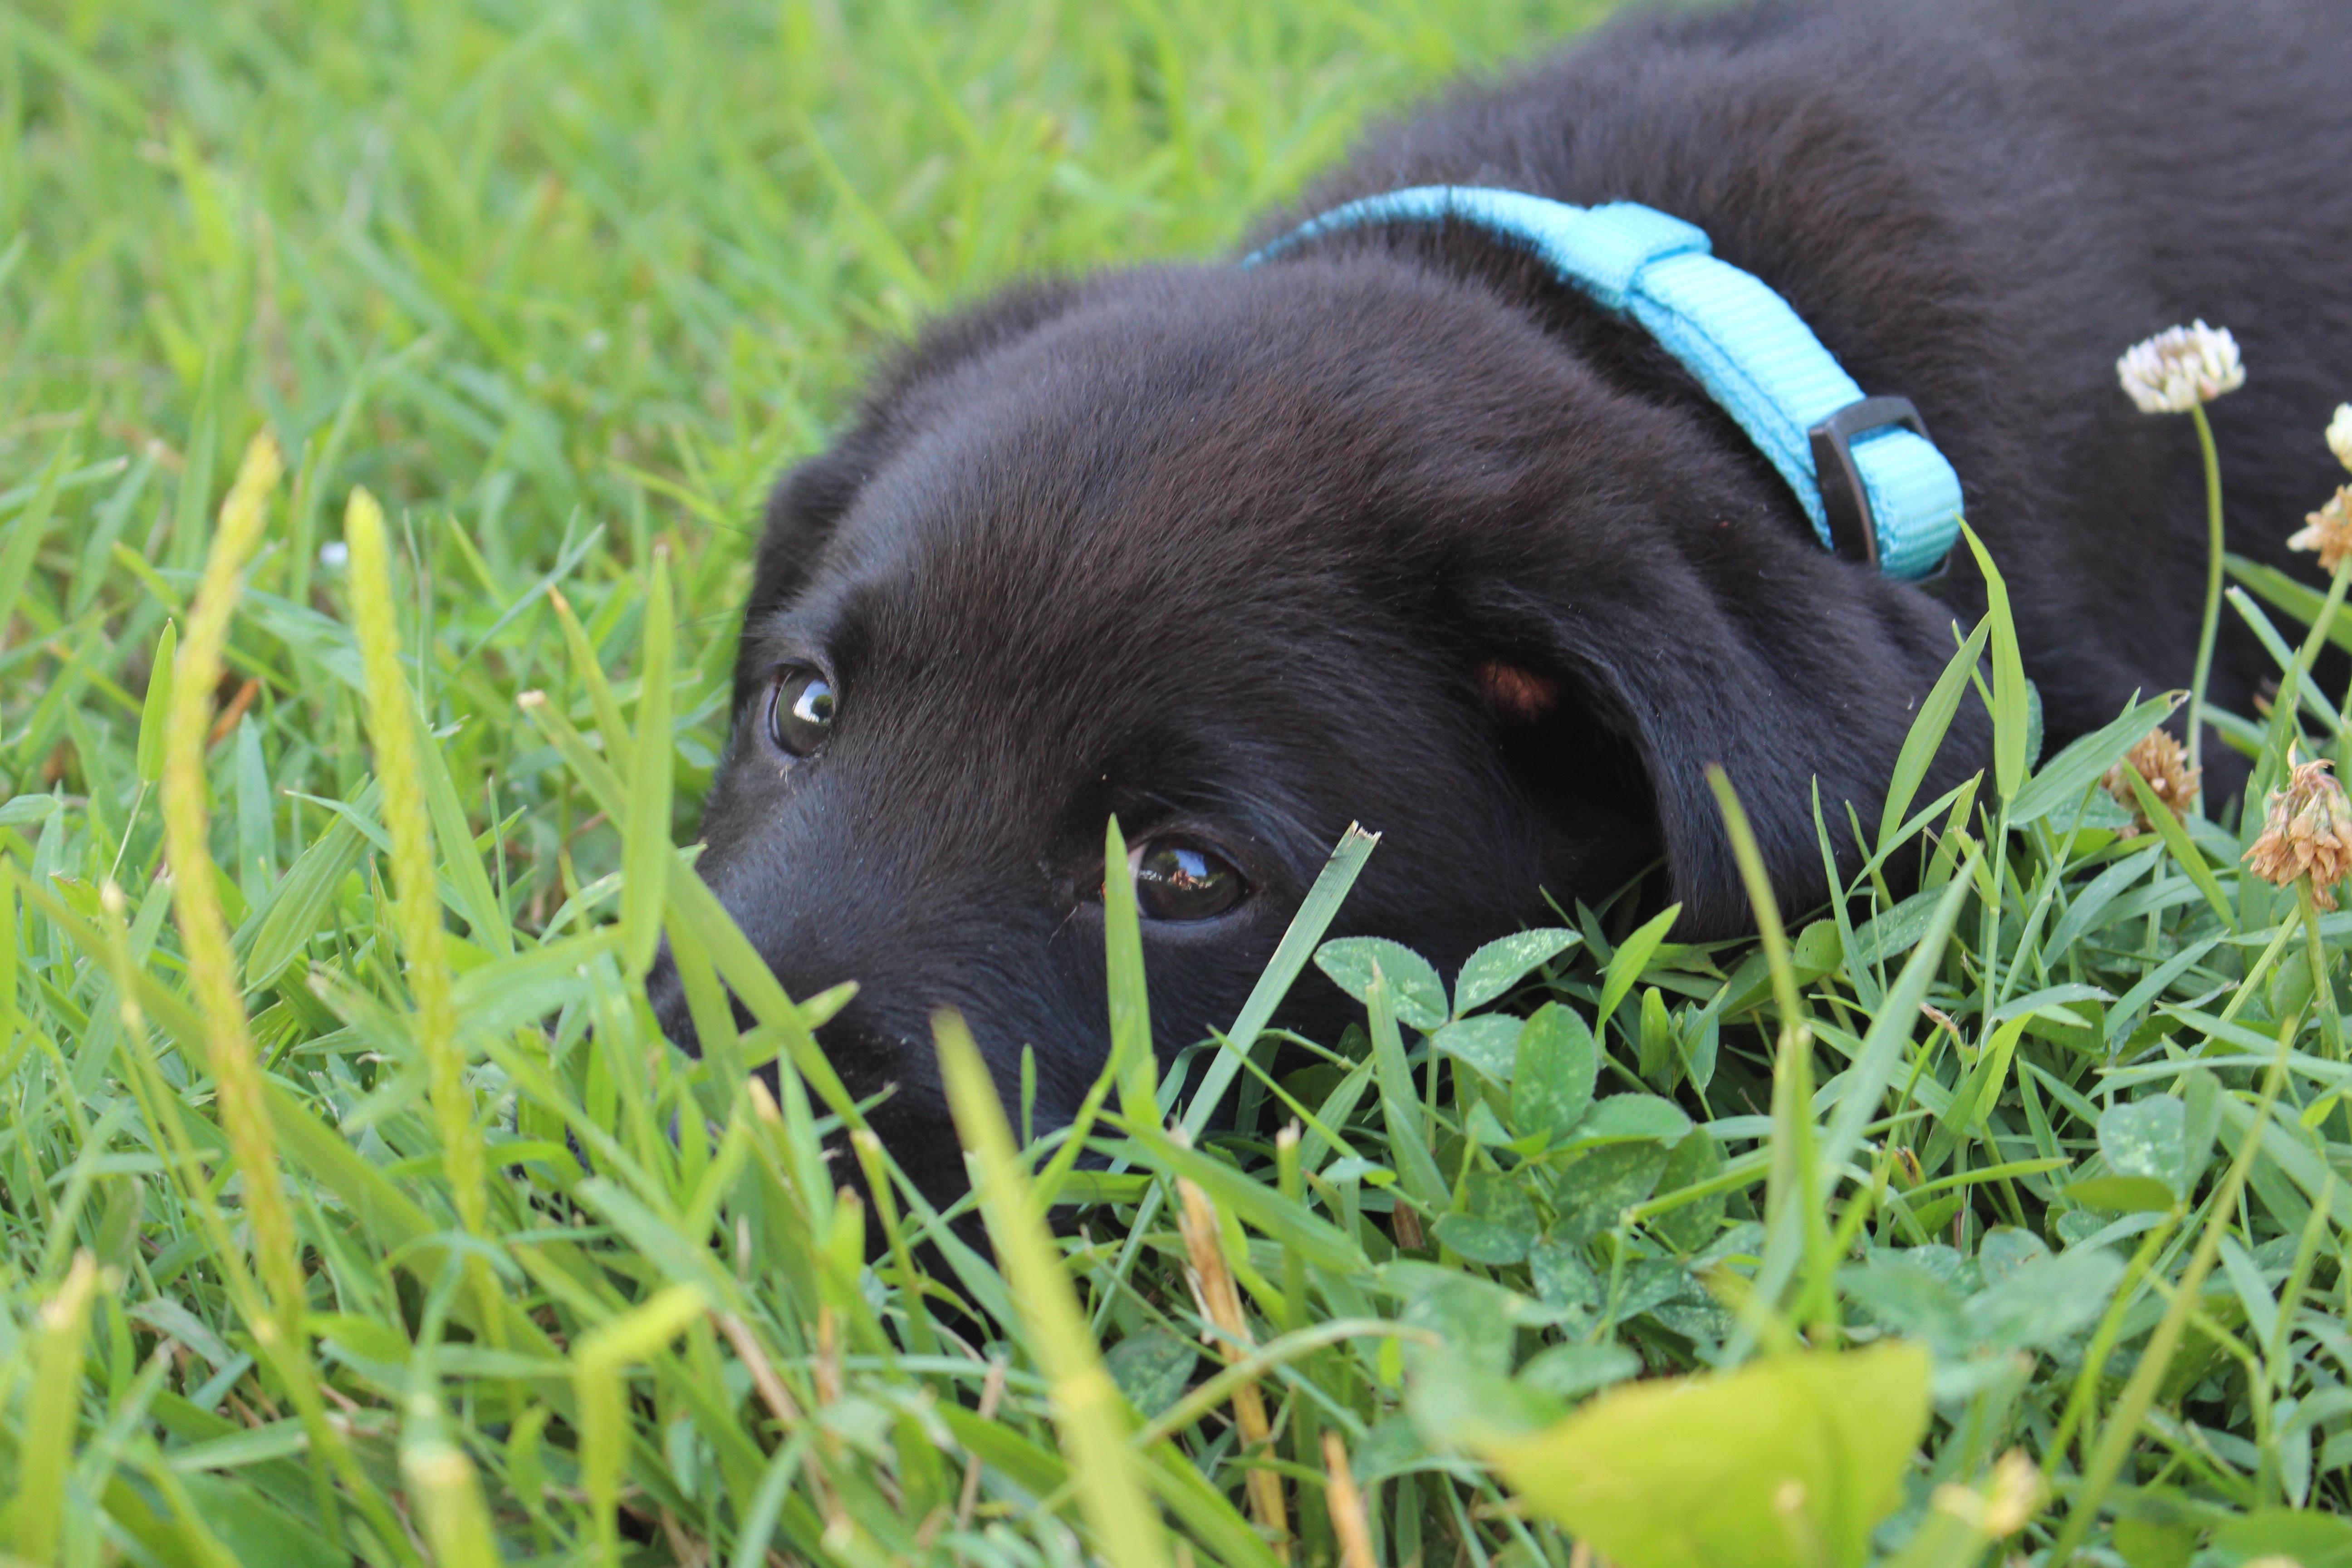 Good Labrador Retriever Black Adorable Dog - grass-puppy-dog-cute-pet-mammal-playing-black-playful-little-vertebrate-labrador-retriever-adorable-labrador-retriever-dog-like-mammal-dog-breed-group-906730  Snapshot_344723  .jpg